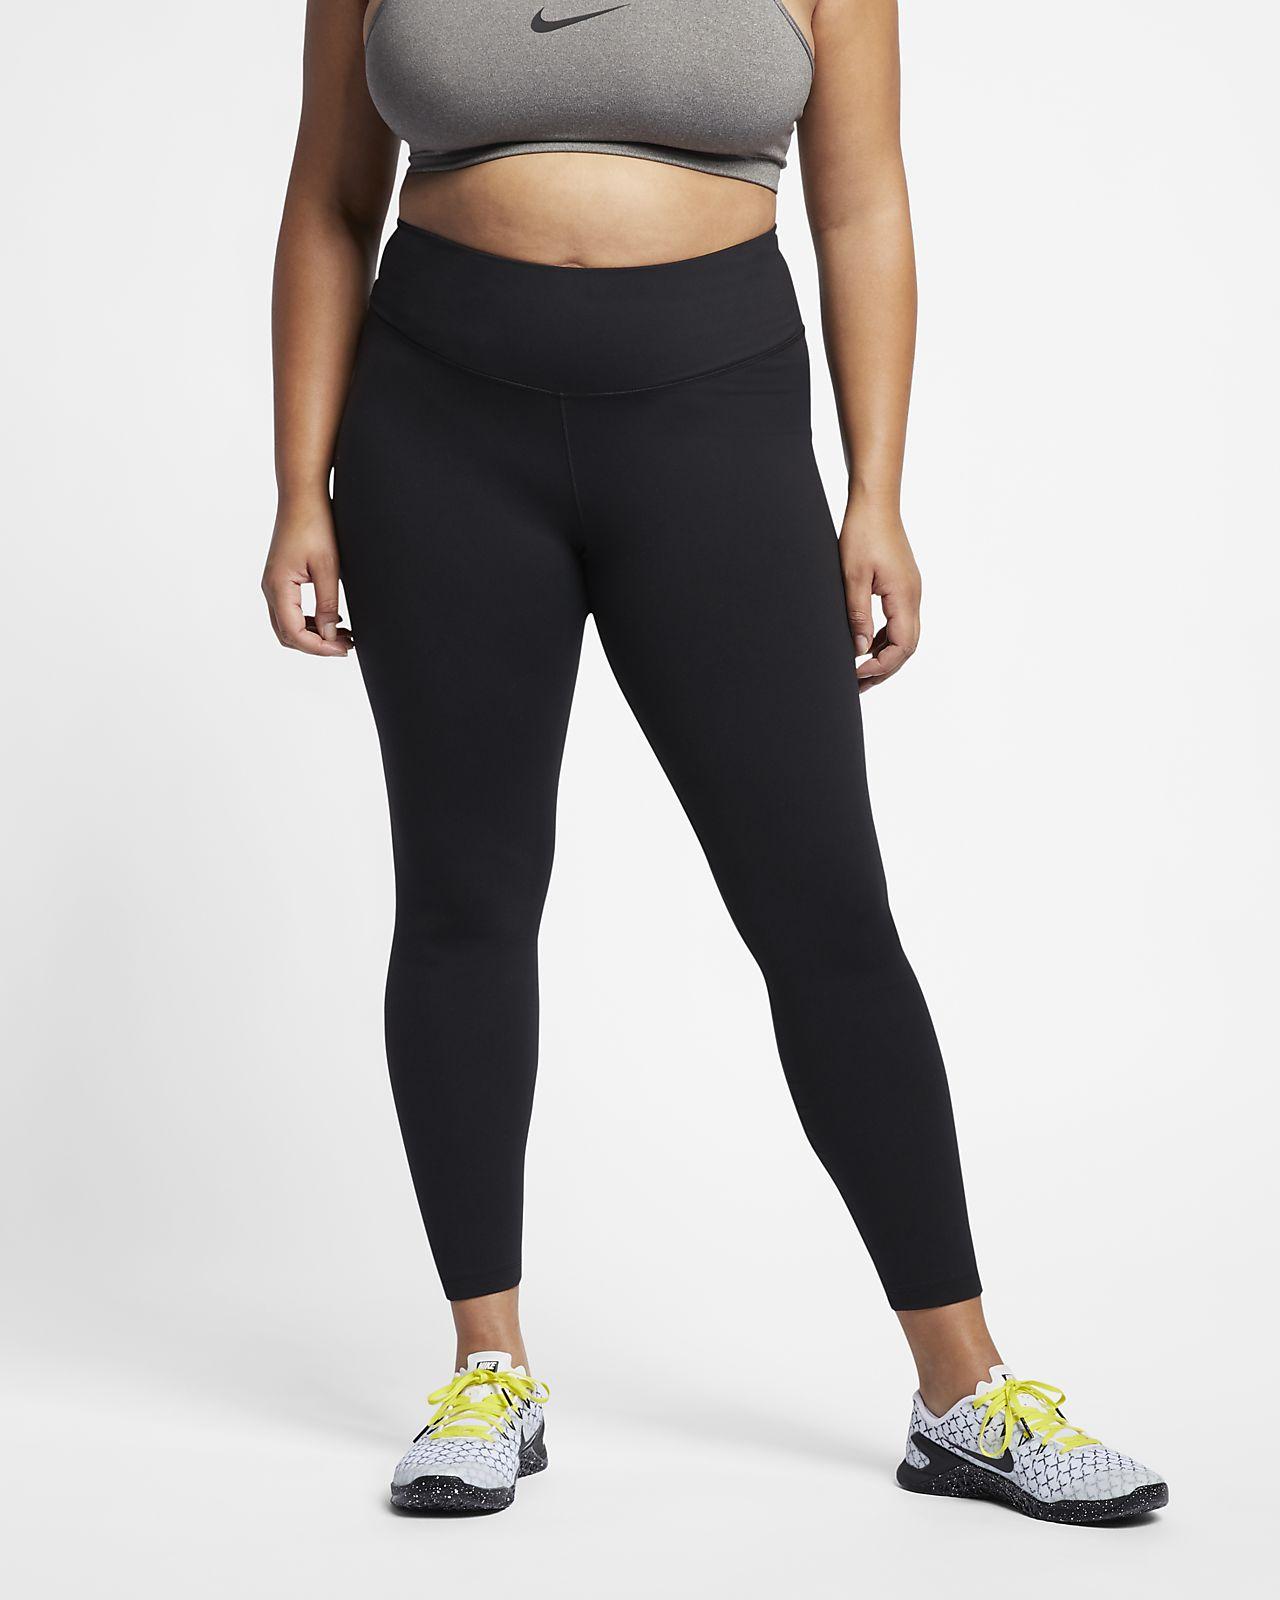 e0355edecf4 Nike Power Sculpt (Plus Size) Women s High-Rise Training Tights ...